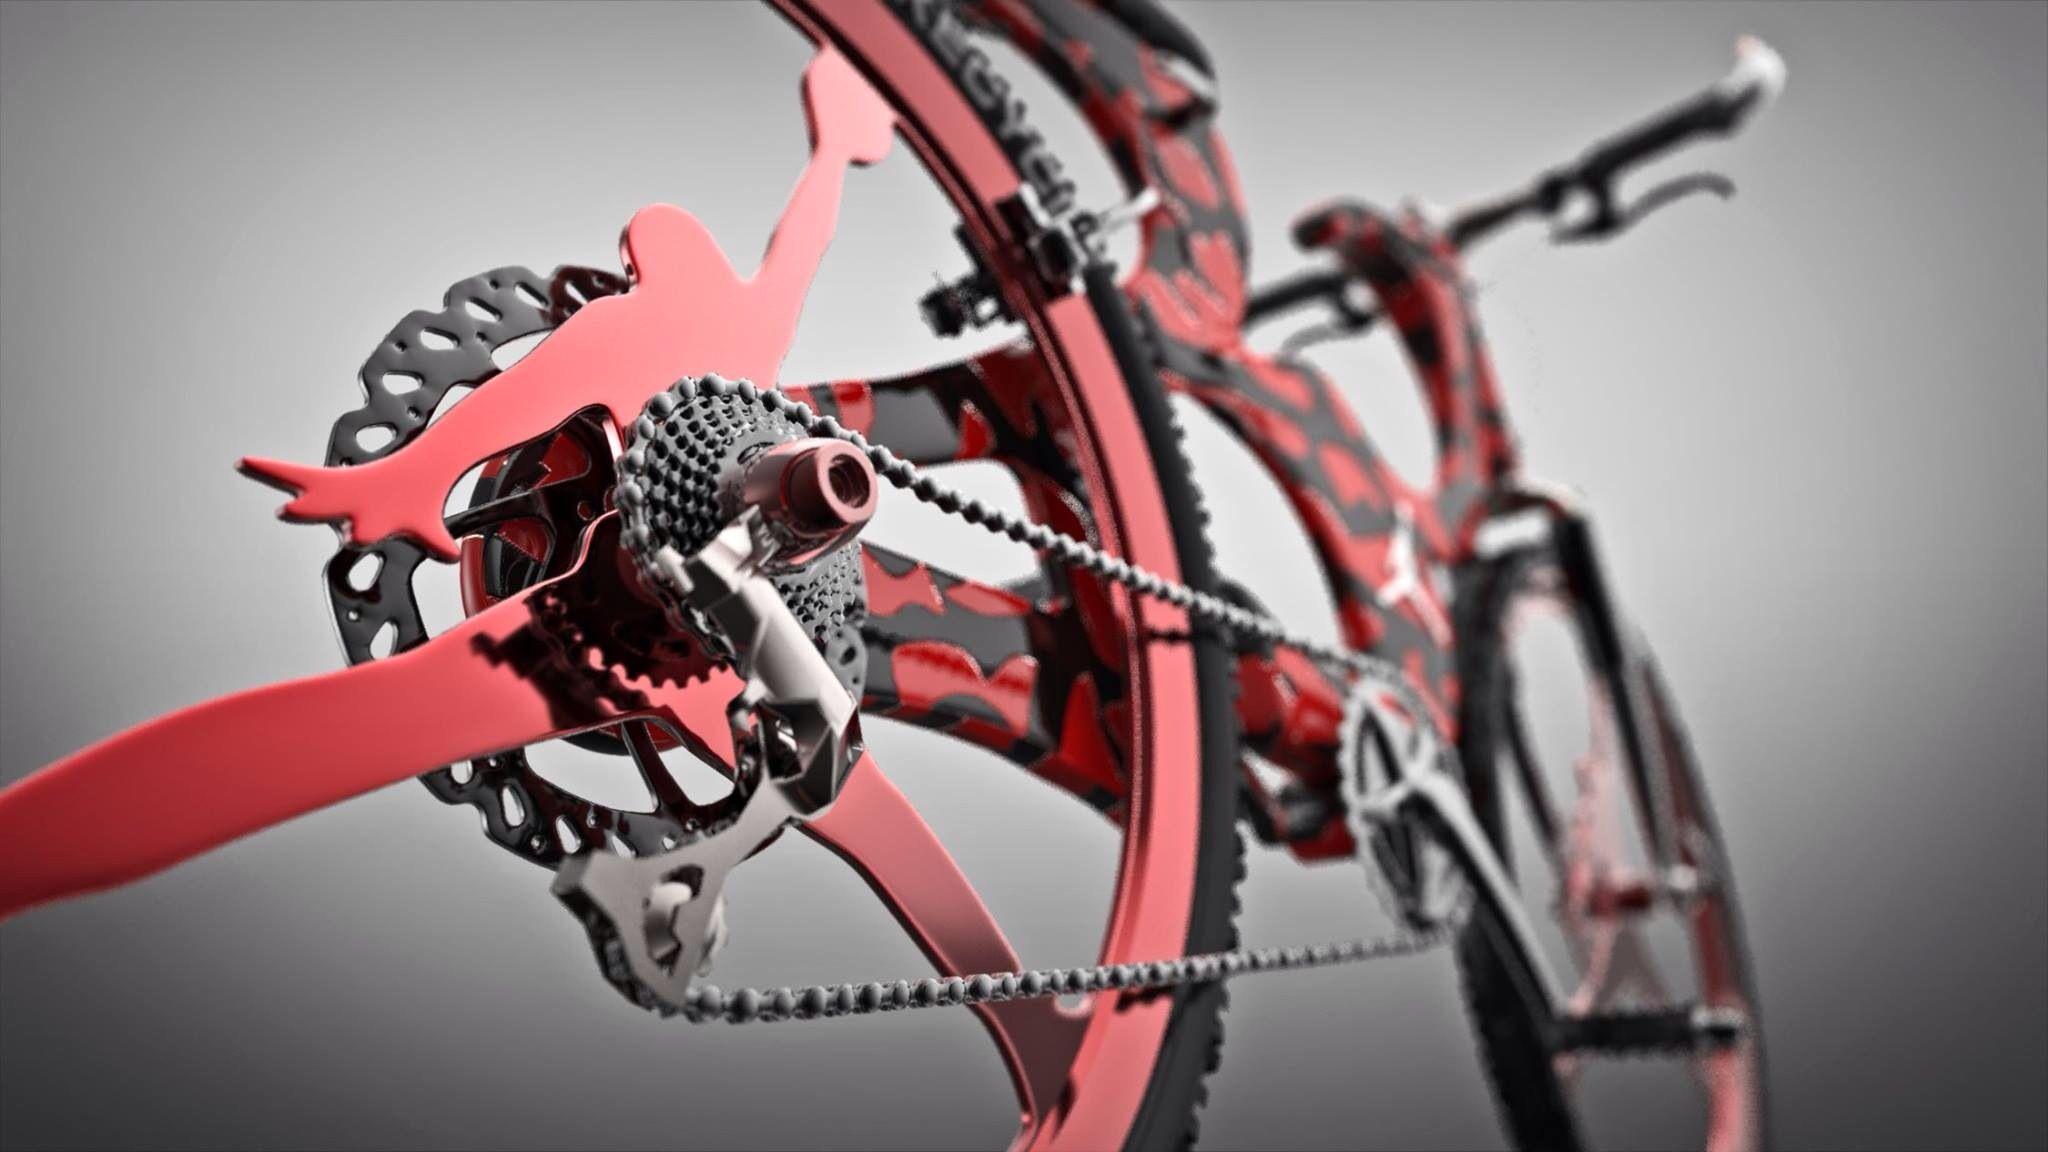 Mike Bike 5 (With images) Bike, Bike swag, Beautiful bike